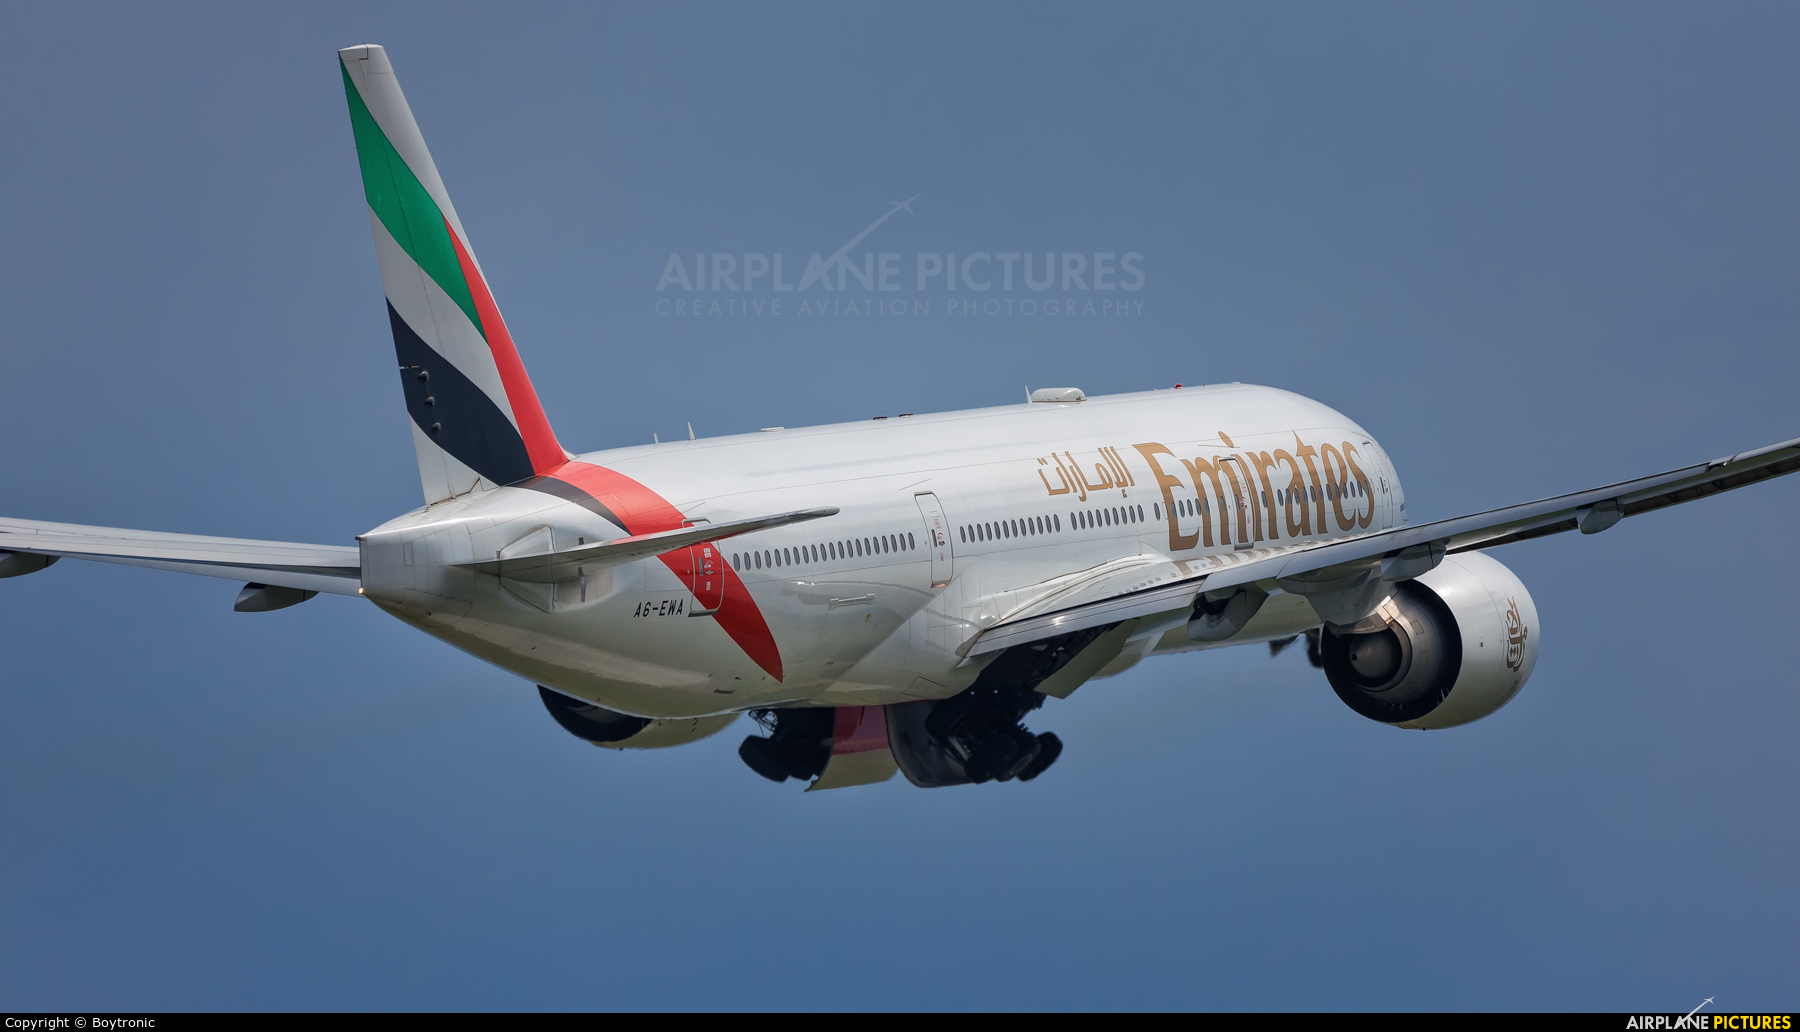 Emirates Airlines A6-EWA aircraft at Zagreb